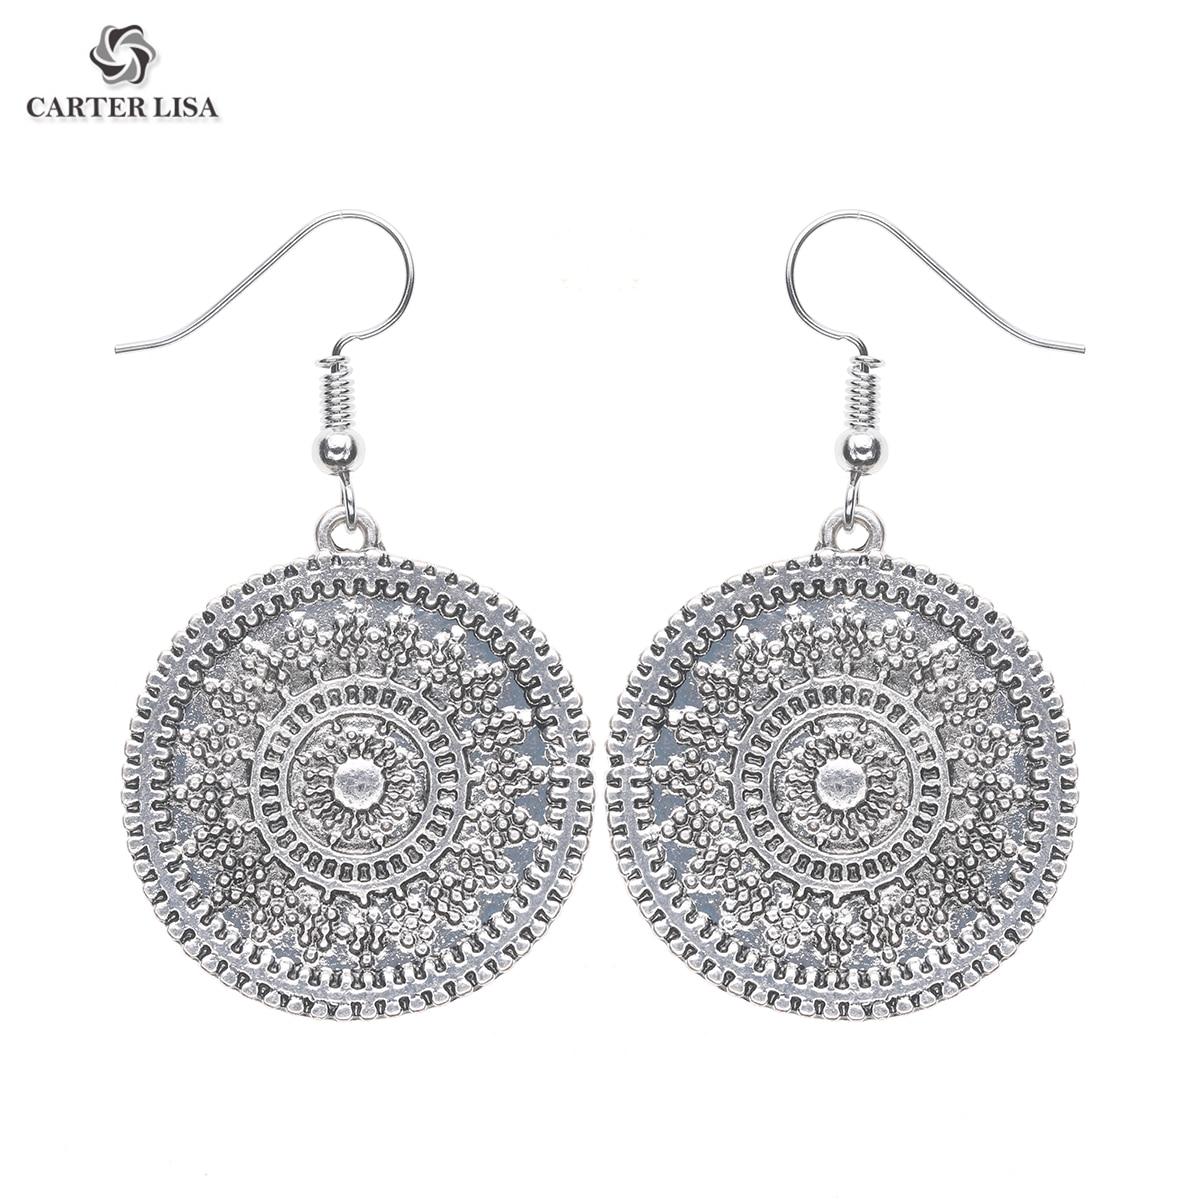 CARTER LISA Fashion 2019 Vintage Earrings 2019 Summer Style Bohemian Alloy Plating Silver Round Pendant Earrings For Women